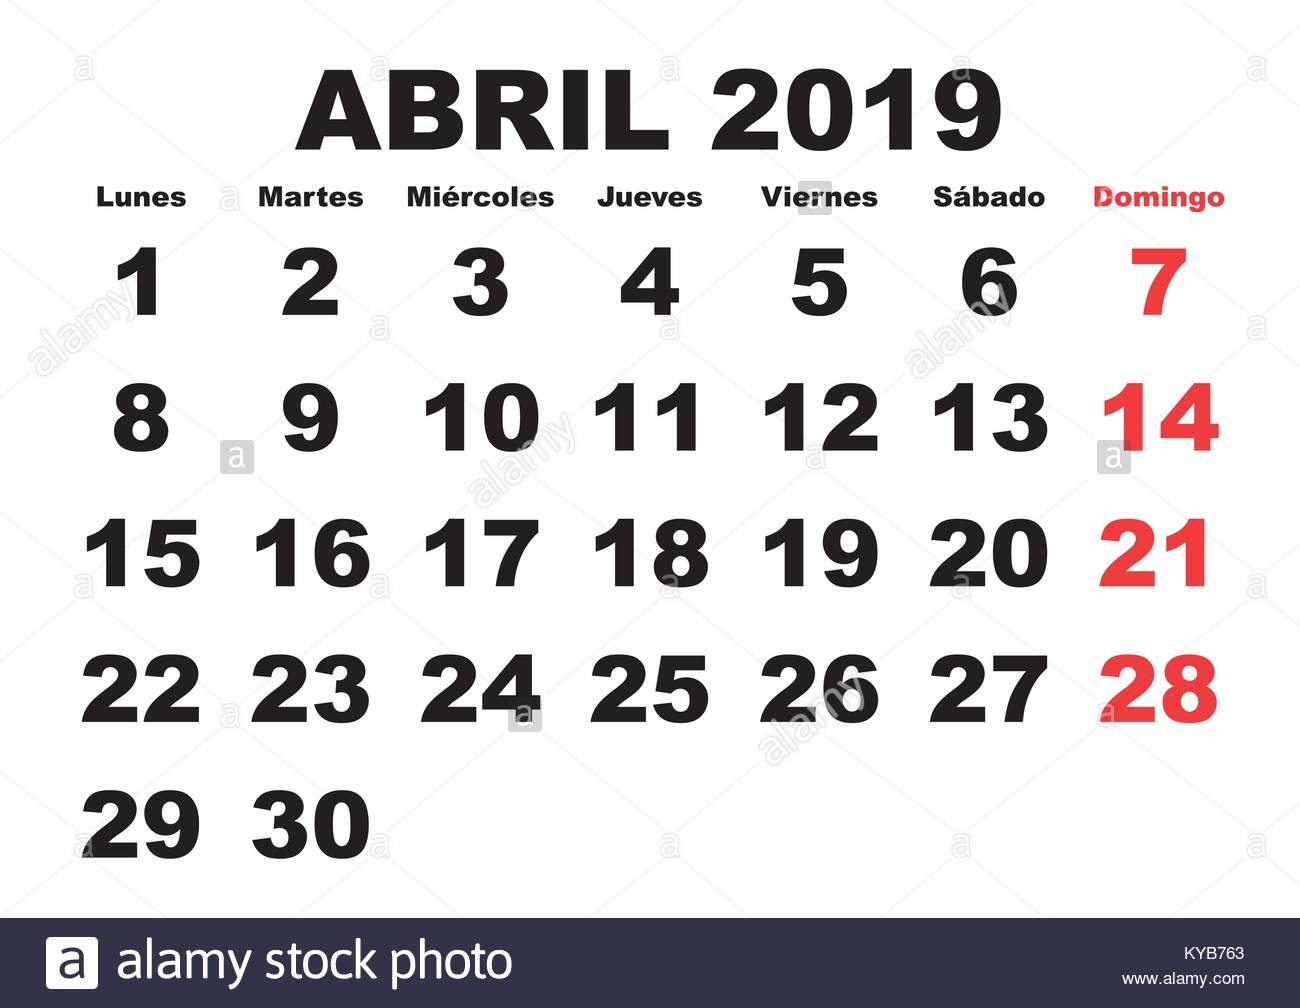 Photosi Calendario.April Month In A Year 2019 Wall Calendar In Spanish Abril